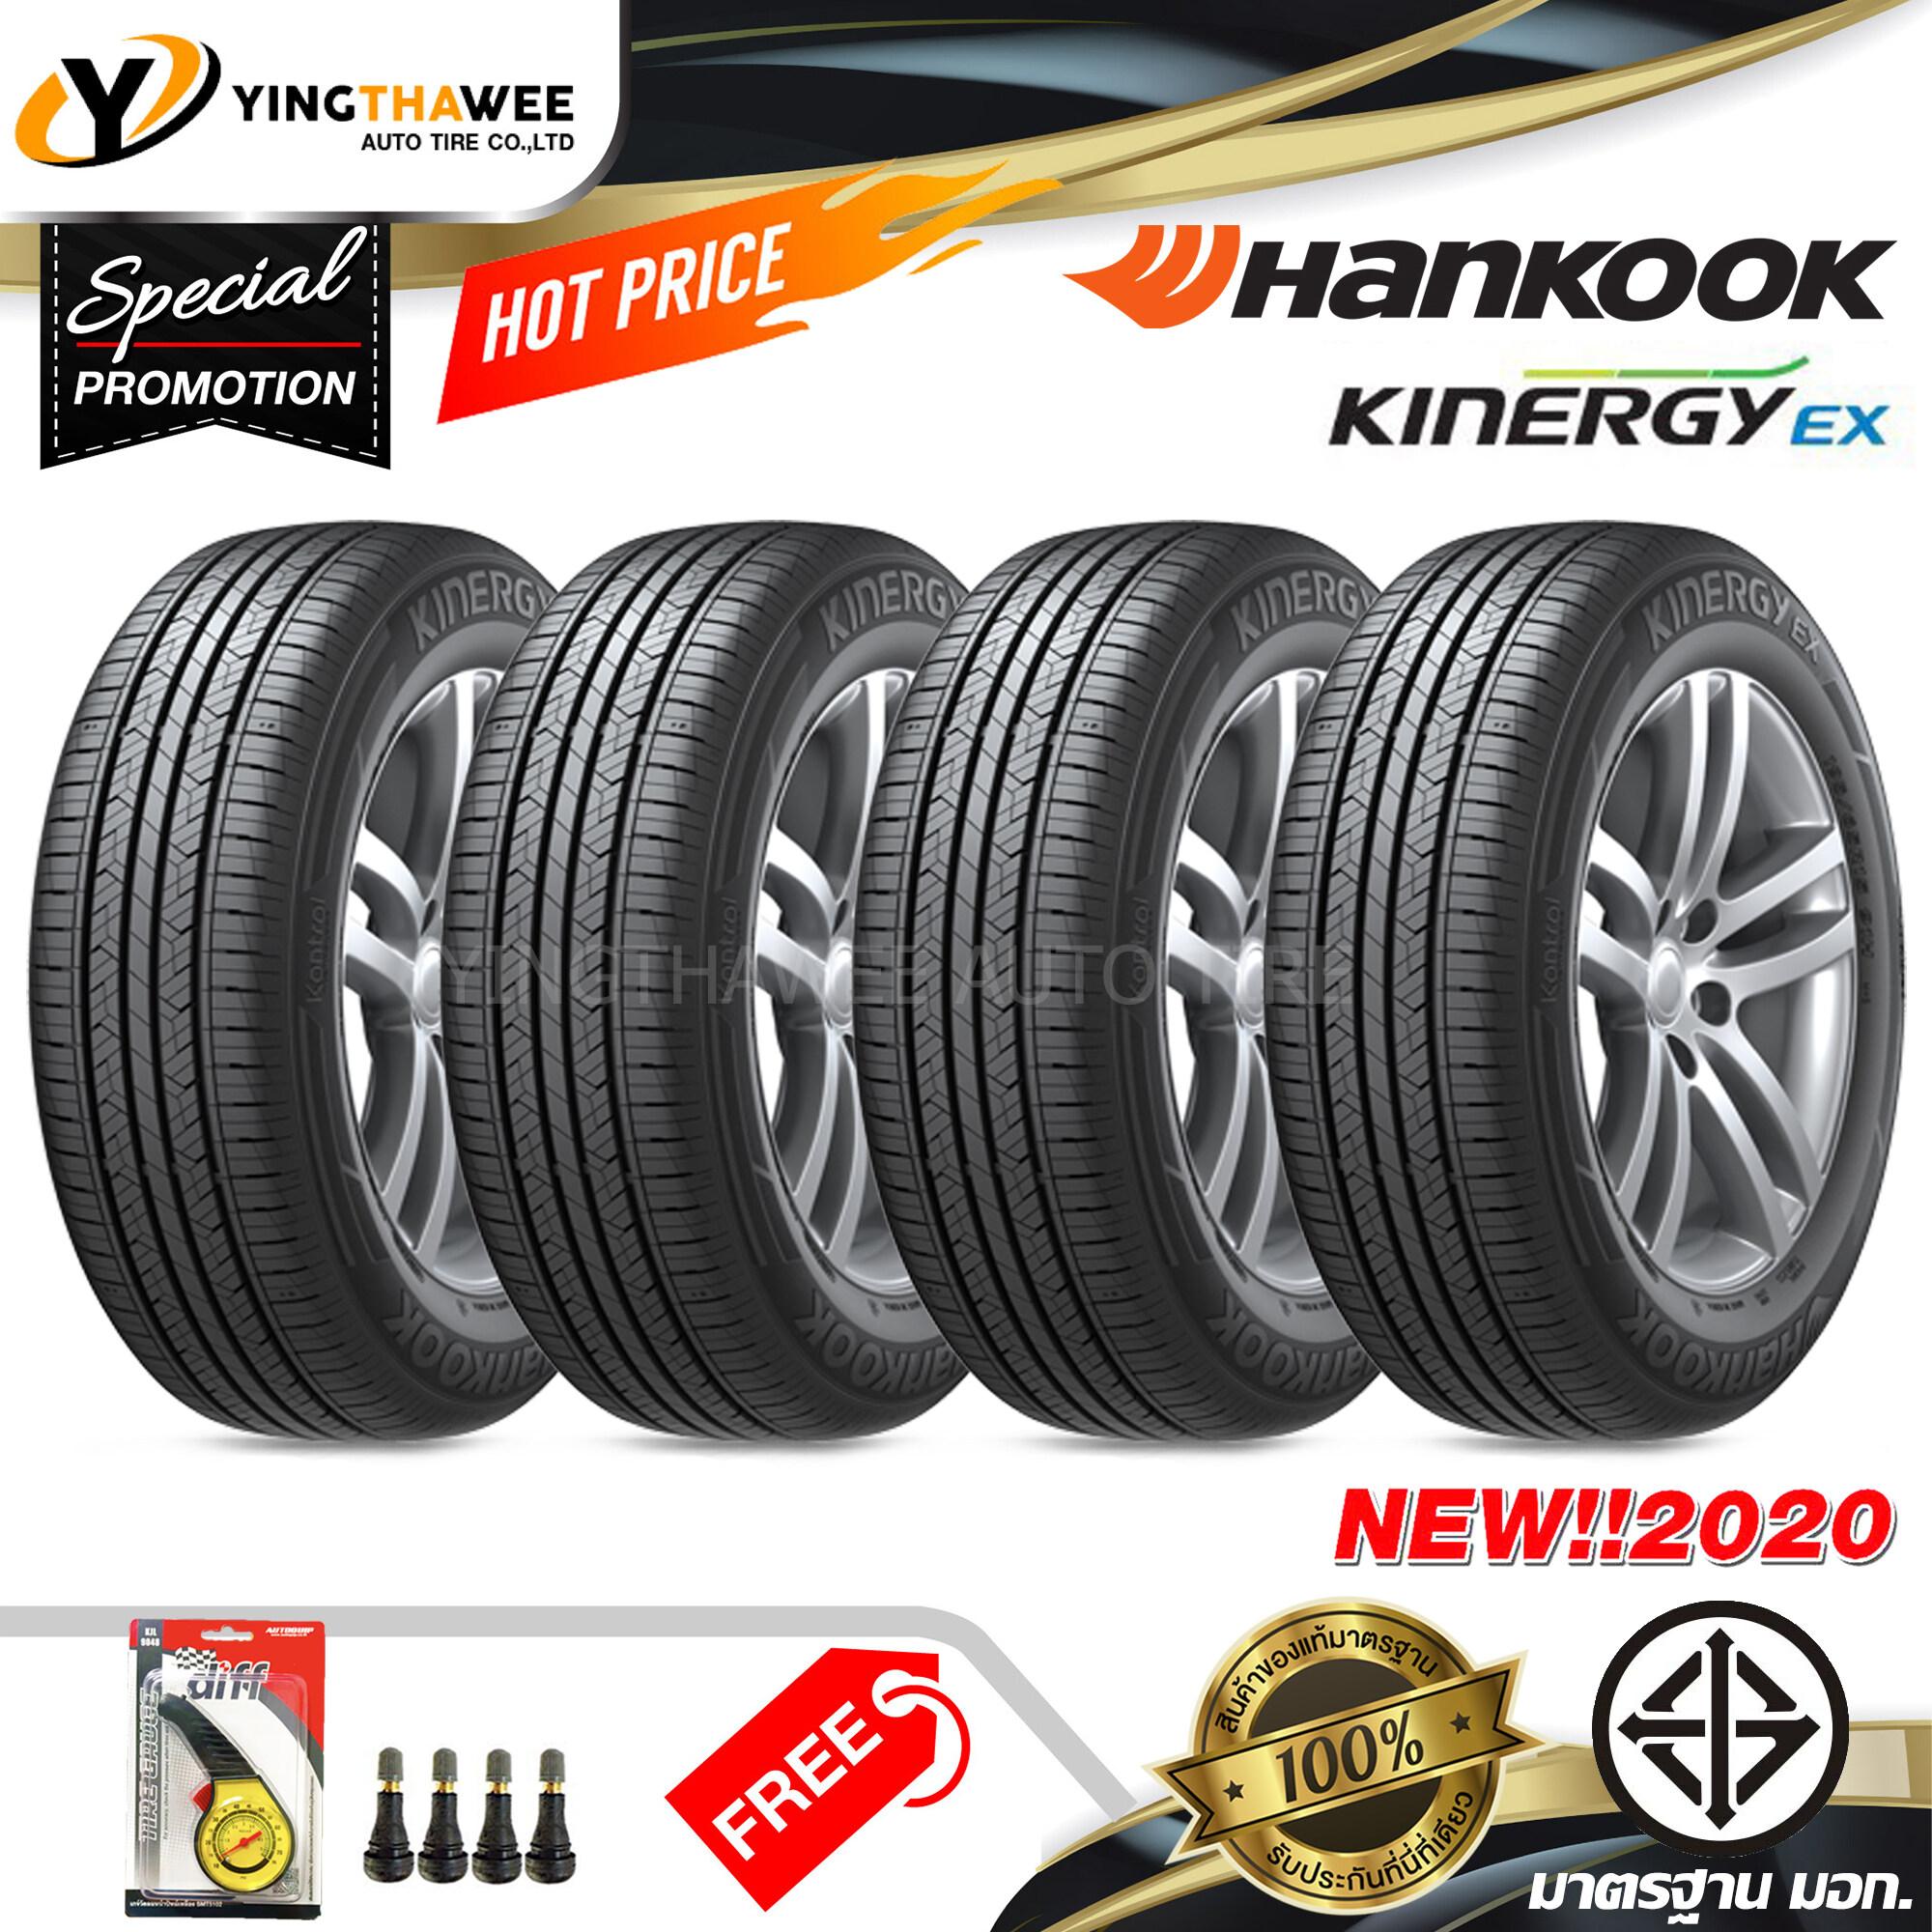 Hankook ยางรถยนต์ 195/50r16 รุ่น H308  4 เส้น (ปี 2020) แถมเกจวัดลมหน้าปัทม์เหลือง 1 ตัว + จุ๊บลมยางแกนทองเหลือง 4 ตัว.